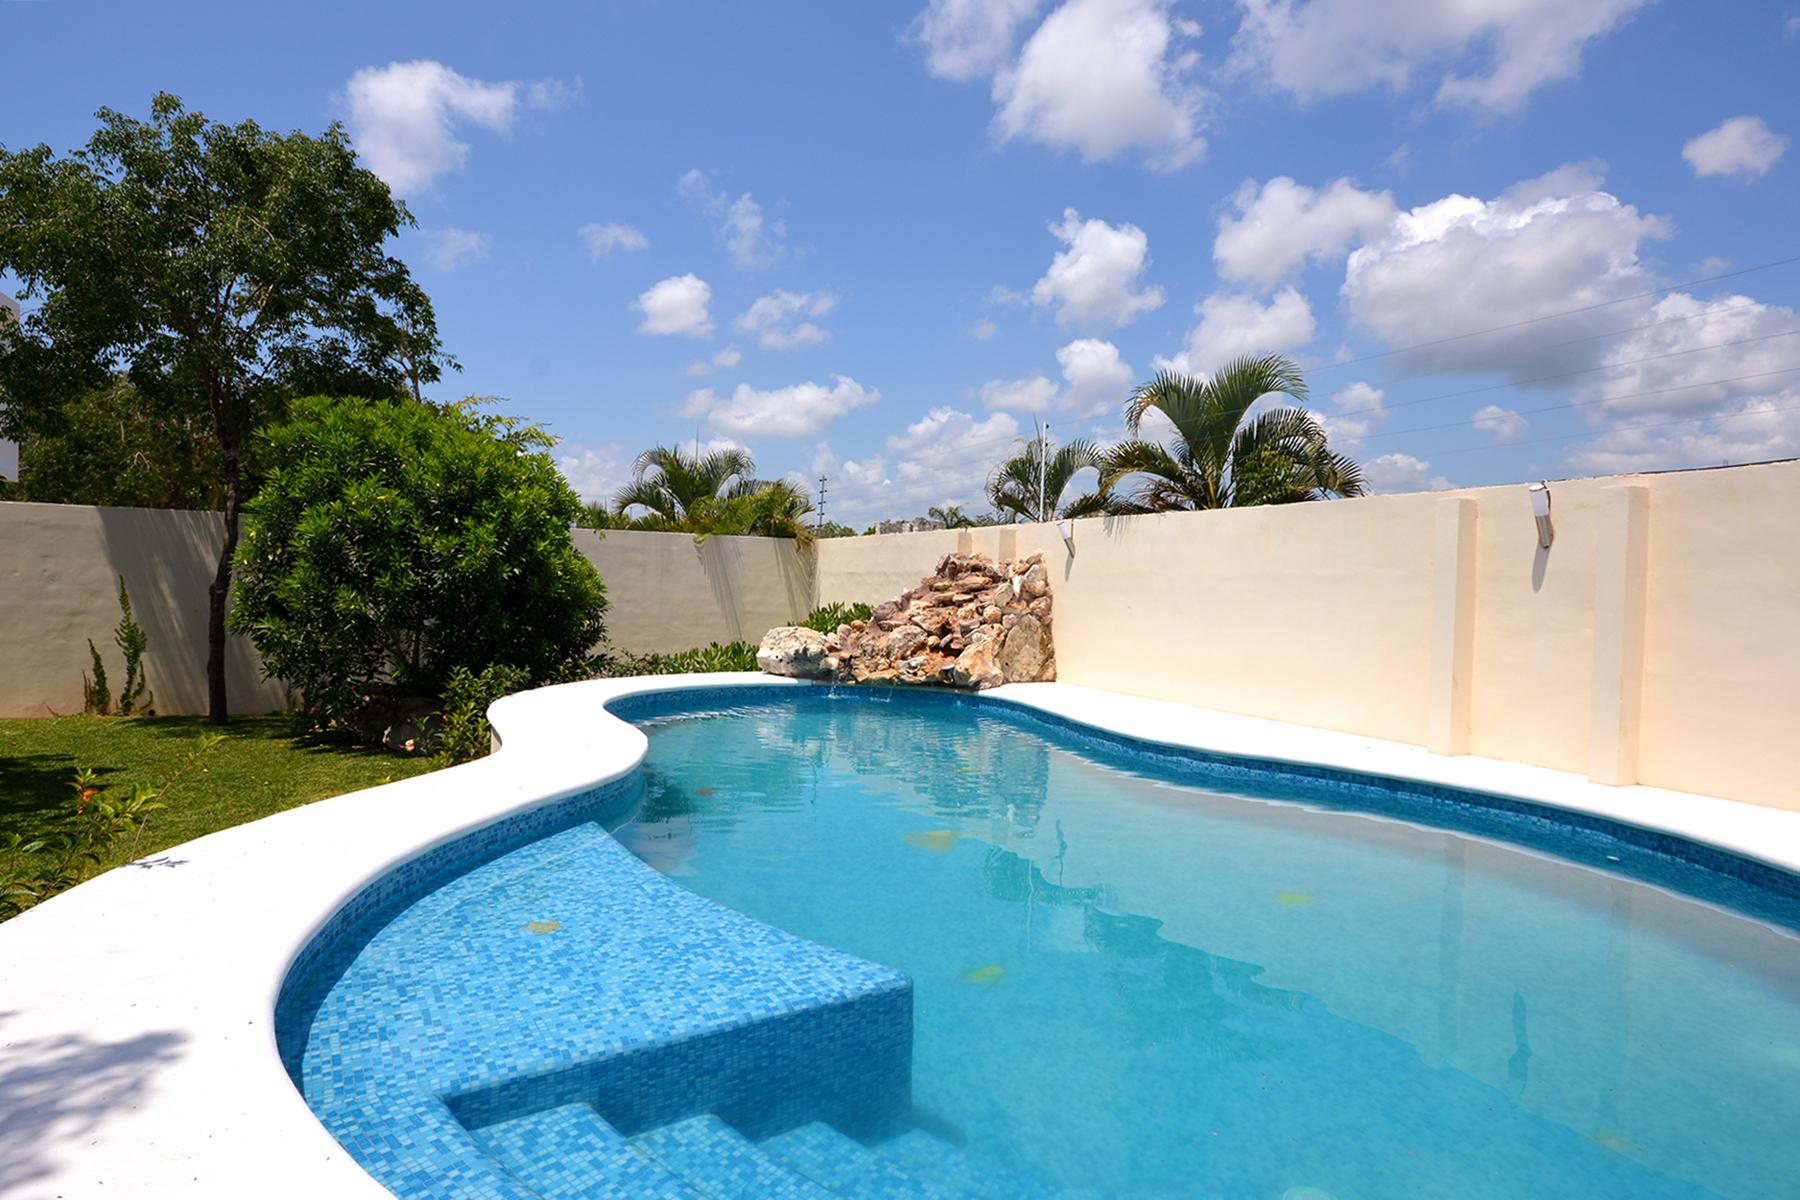 Additional photo for property listing at ENCHANTING GARDEN HOUSE Playa Magna Lote número 42 Y 43 Playa Del Carmen, Quintana Roo 77726 Mexico